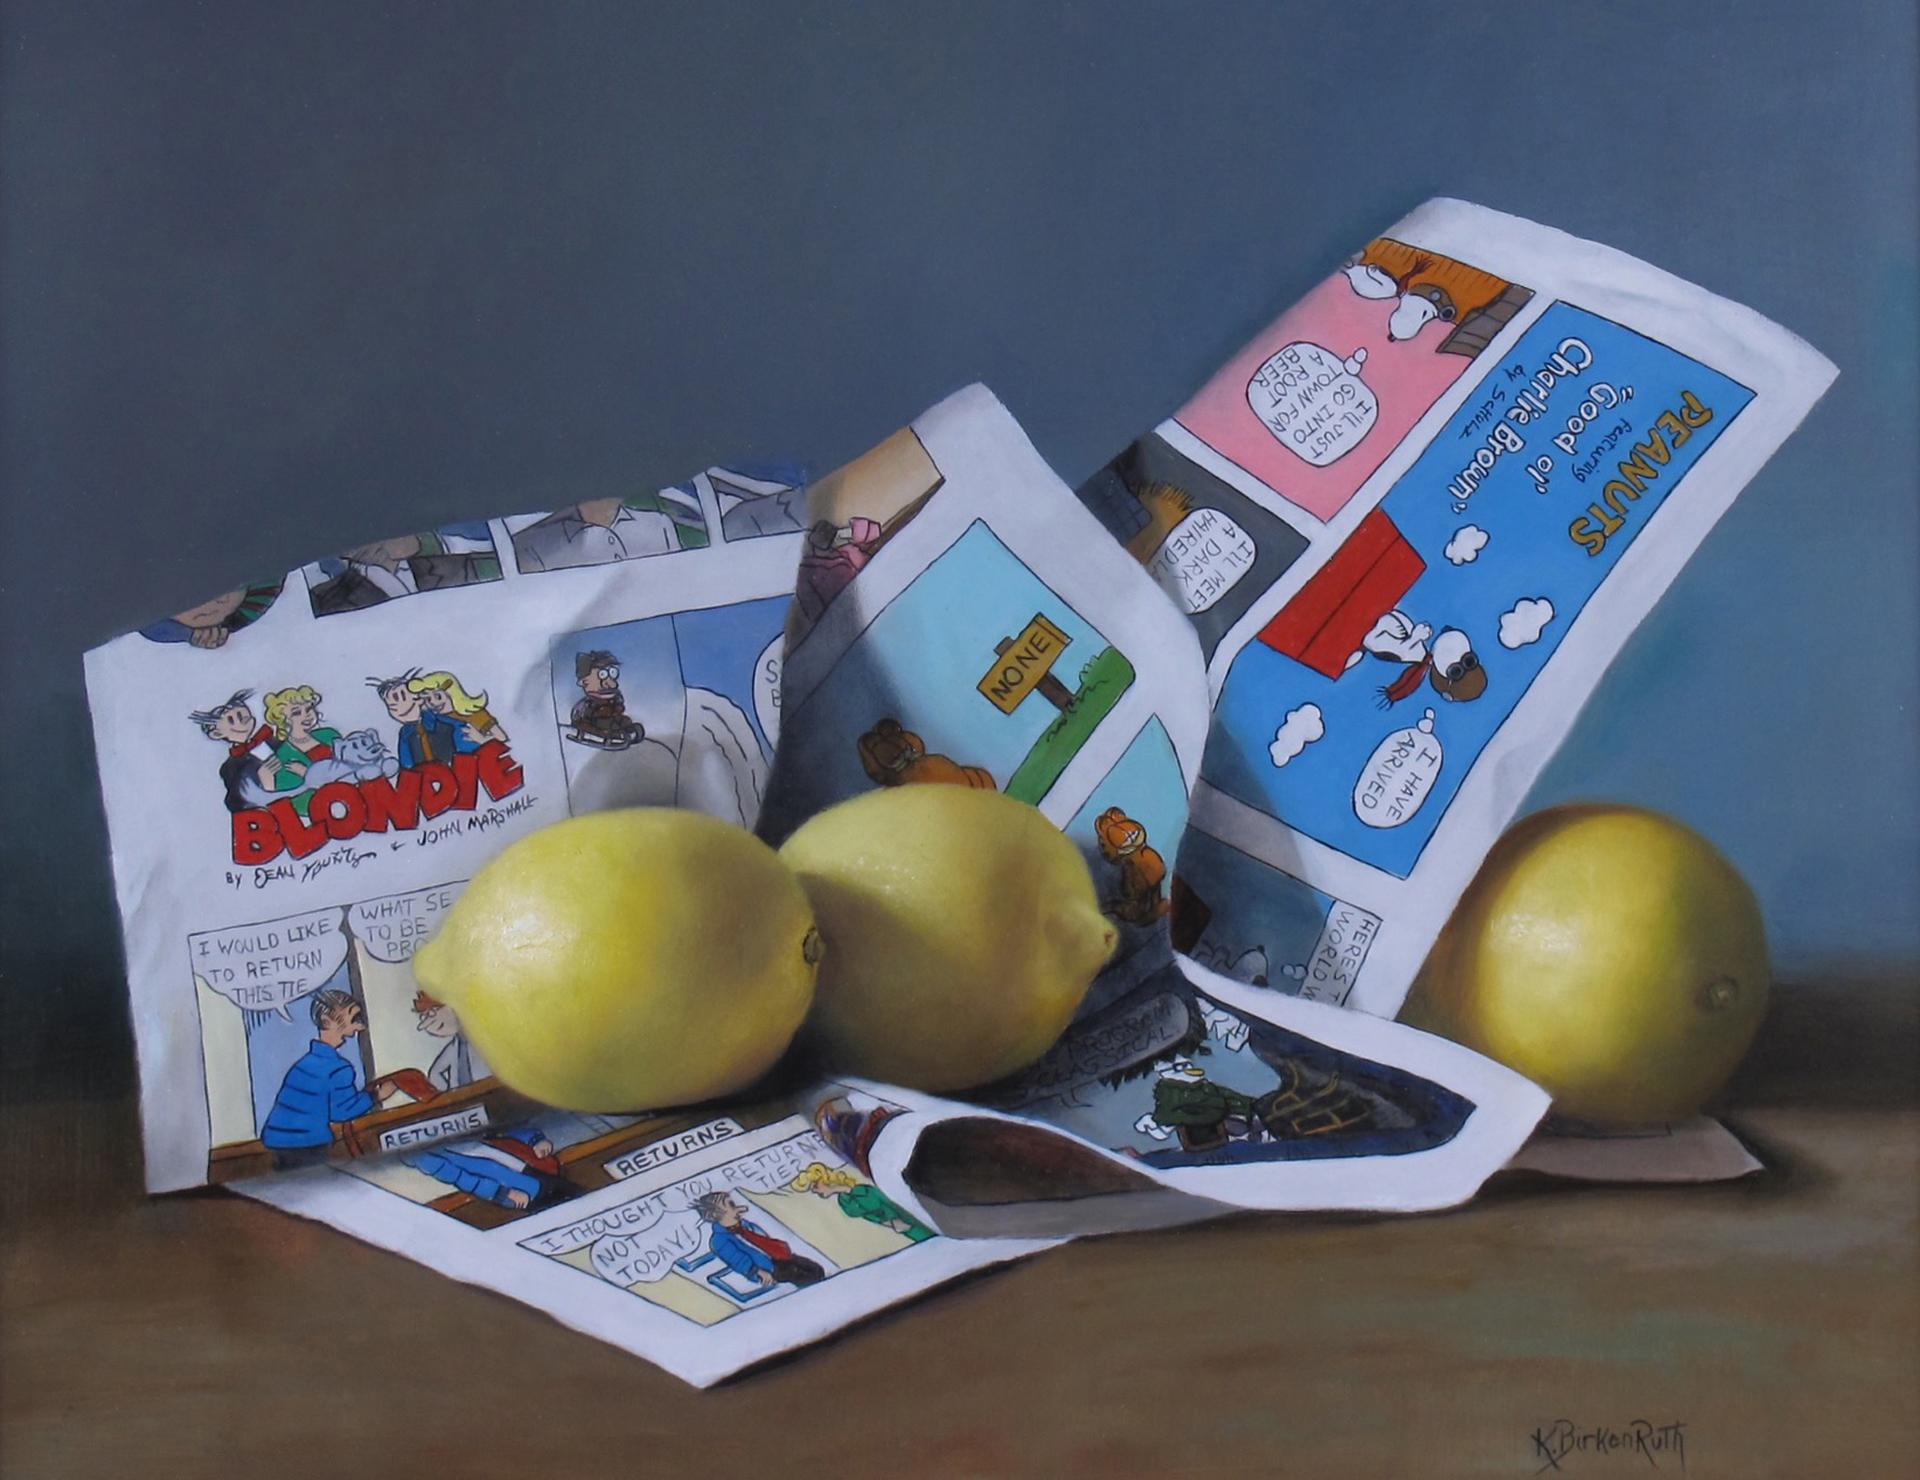 Citrusy Smiles by Kelly Birkenruth